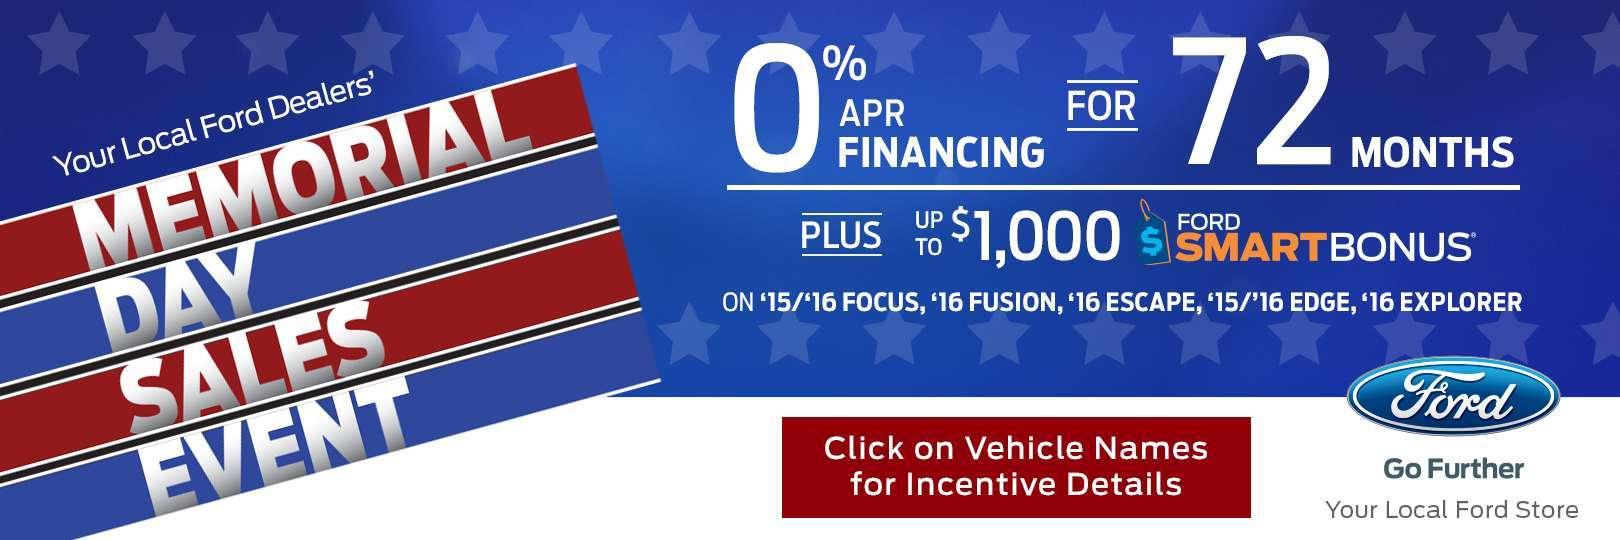 Memorial Day Used Car Deals